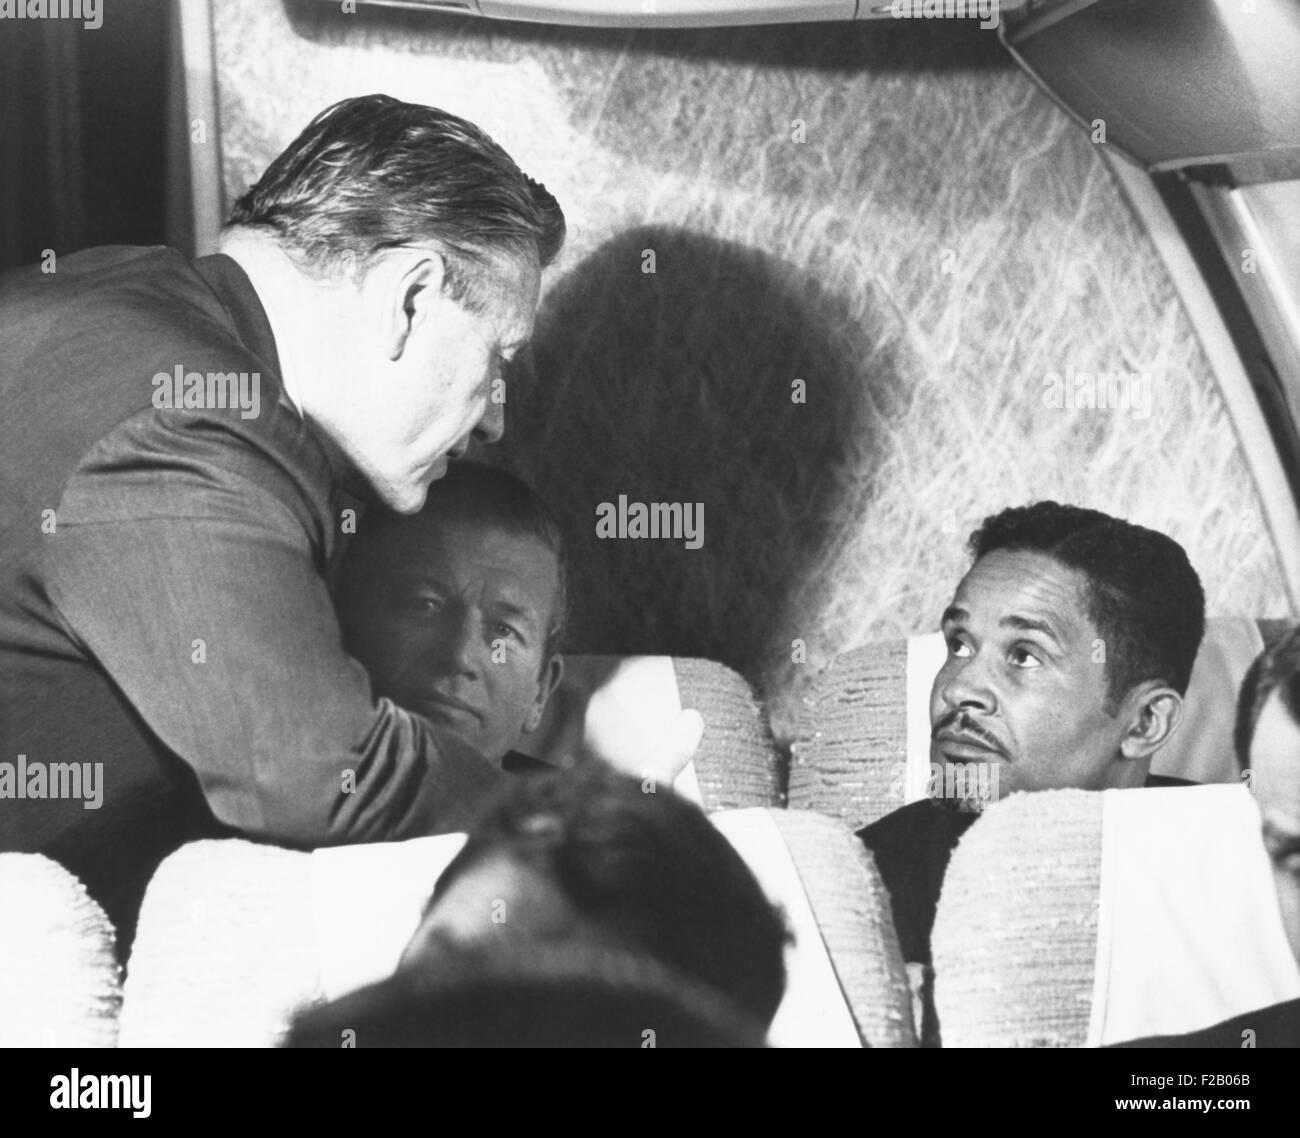 New York State Politiker fliegen zu Martin Luther King Jr. Beerdigung am 9. April 1968. Gouverneur Nelson Rockefeller Stockbild